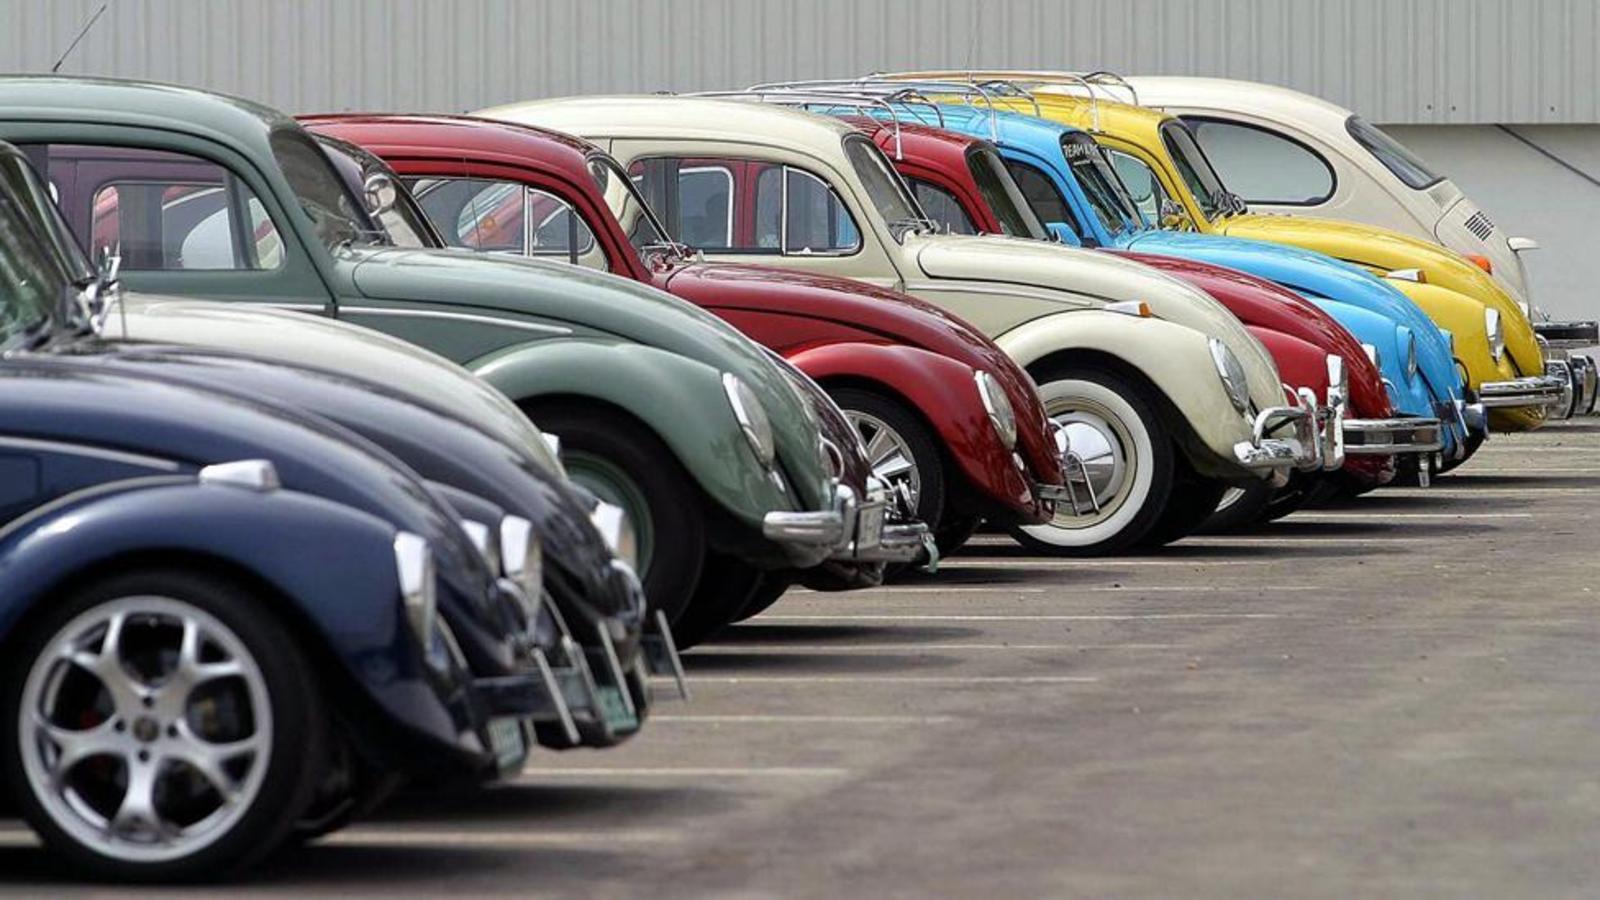 xe con bọ the beetle volkswagen - elle man 7